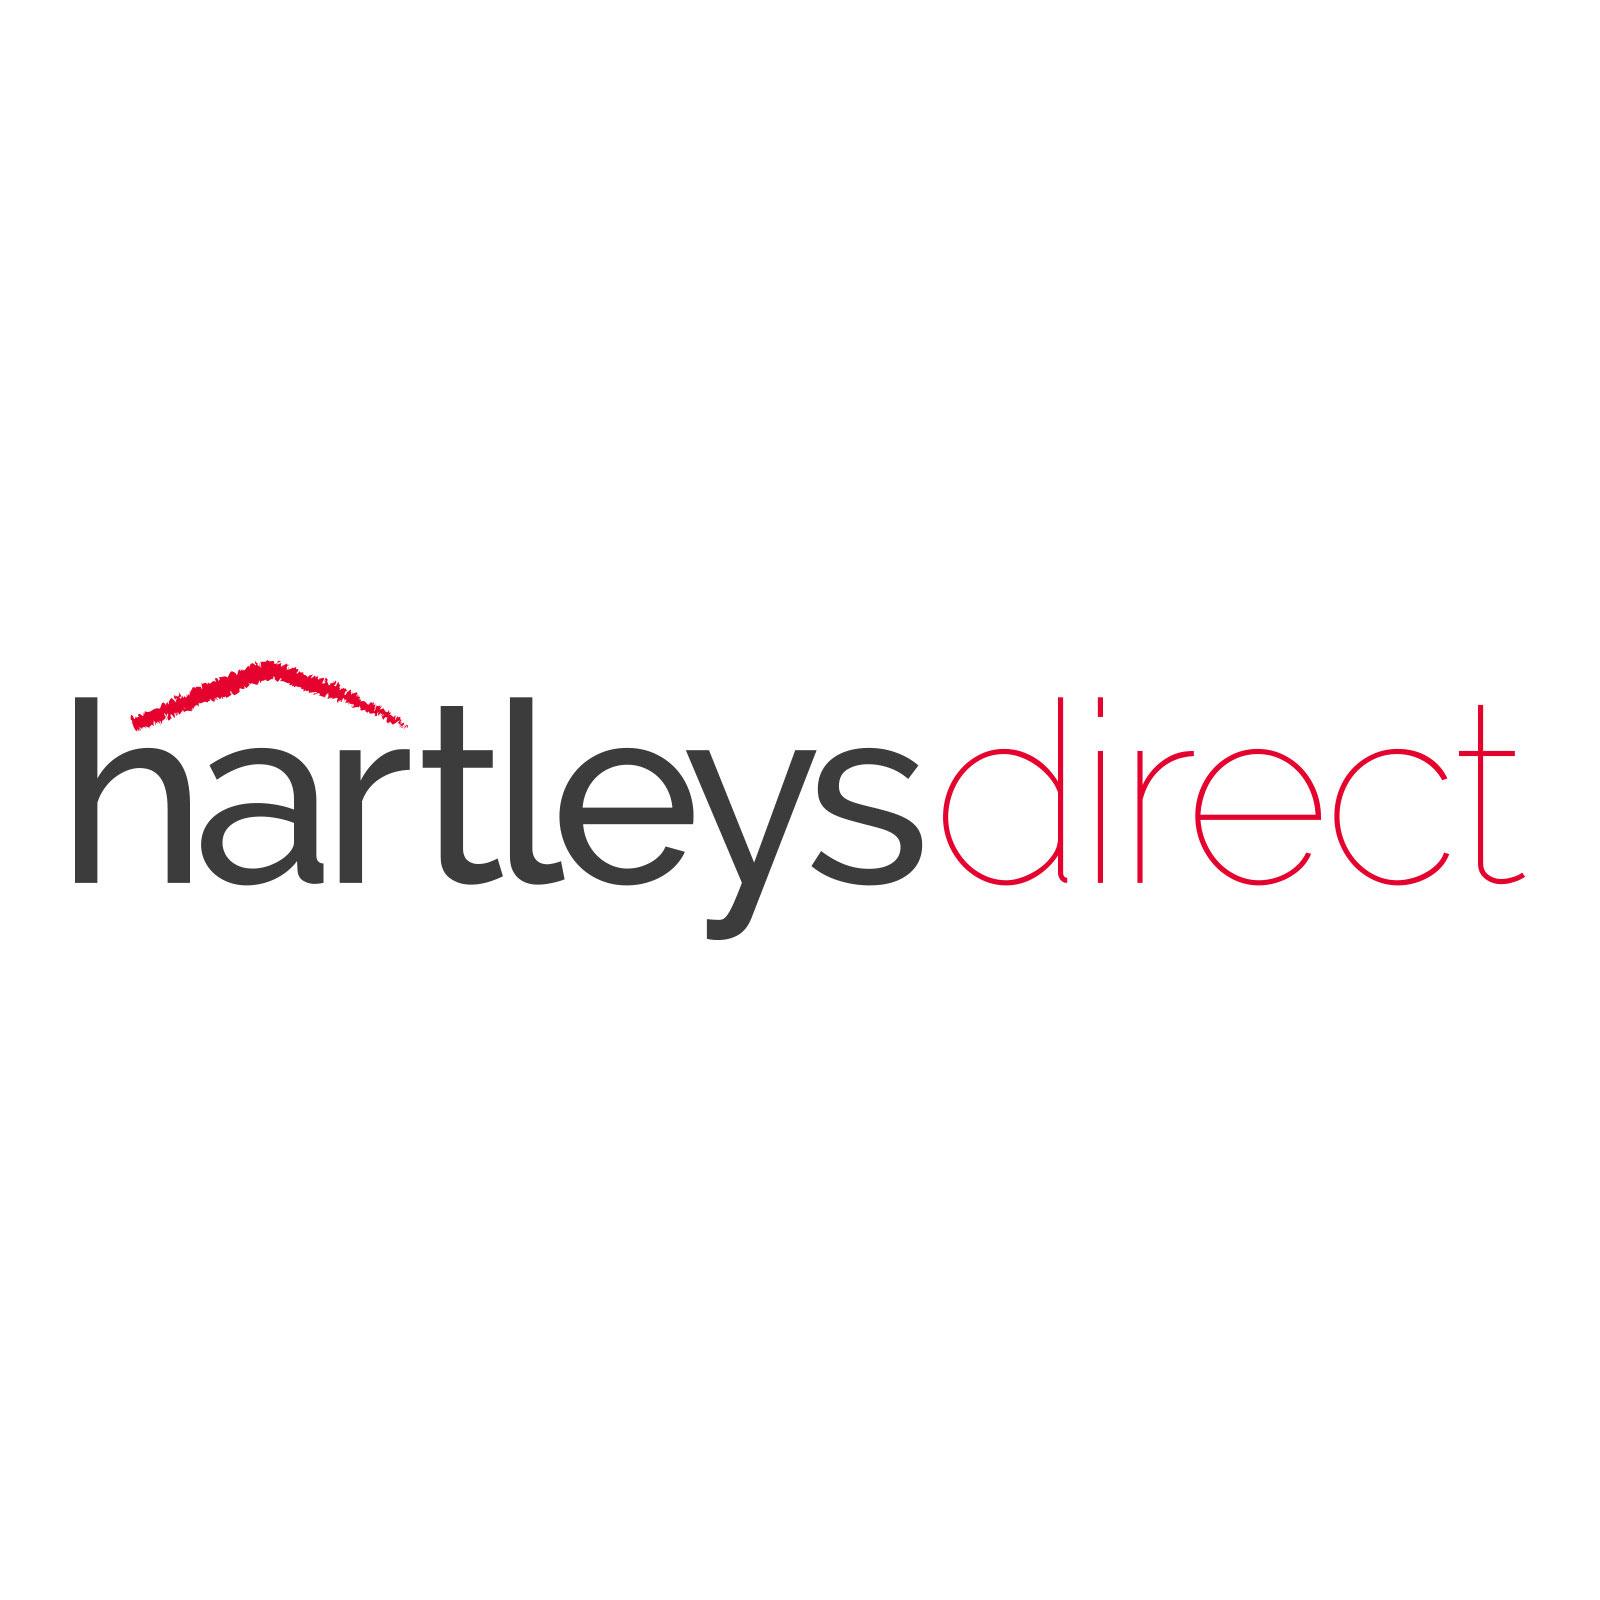 Hartleys-Black-Office-Chair-Base-and-Castor-Wheels-on-White-Background.jpg